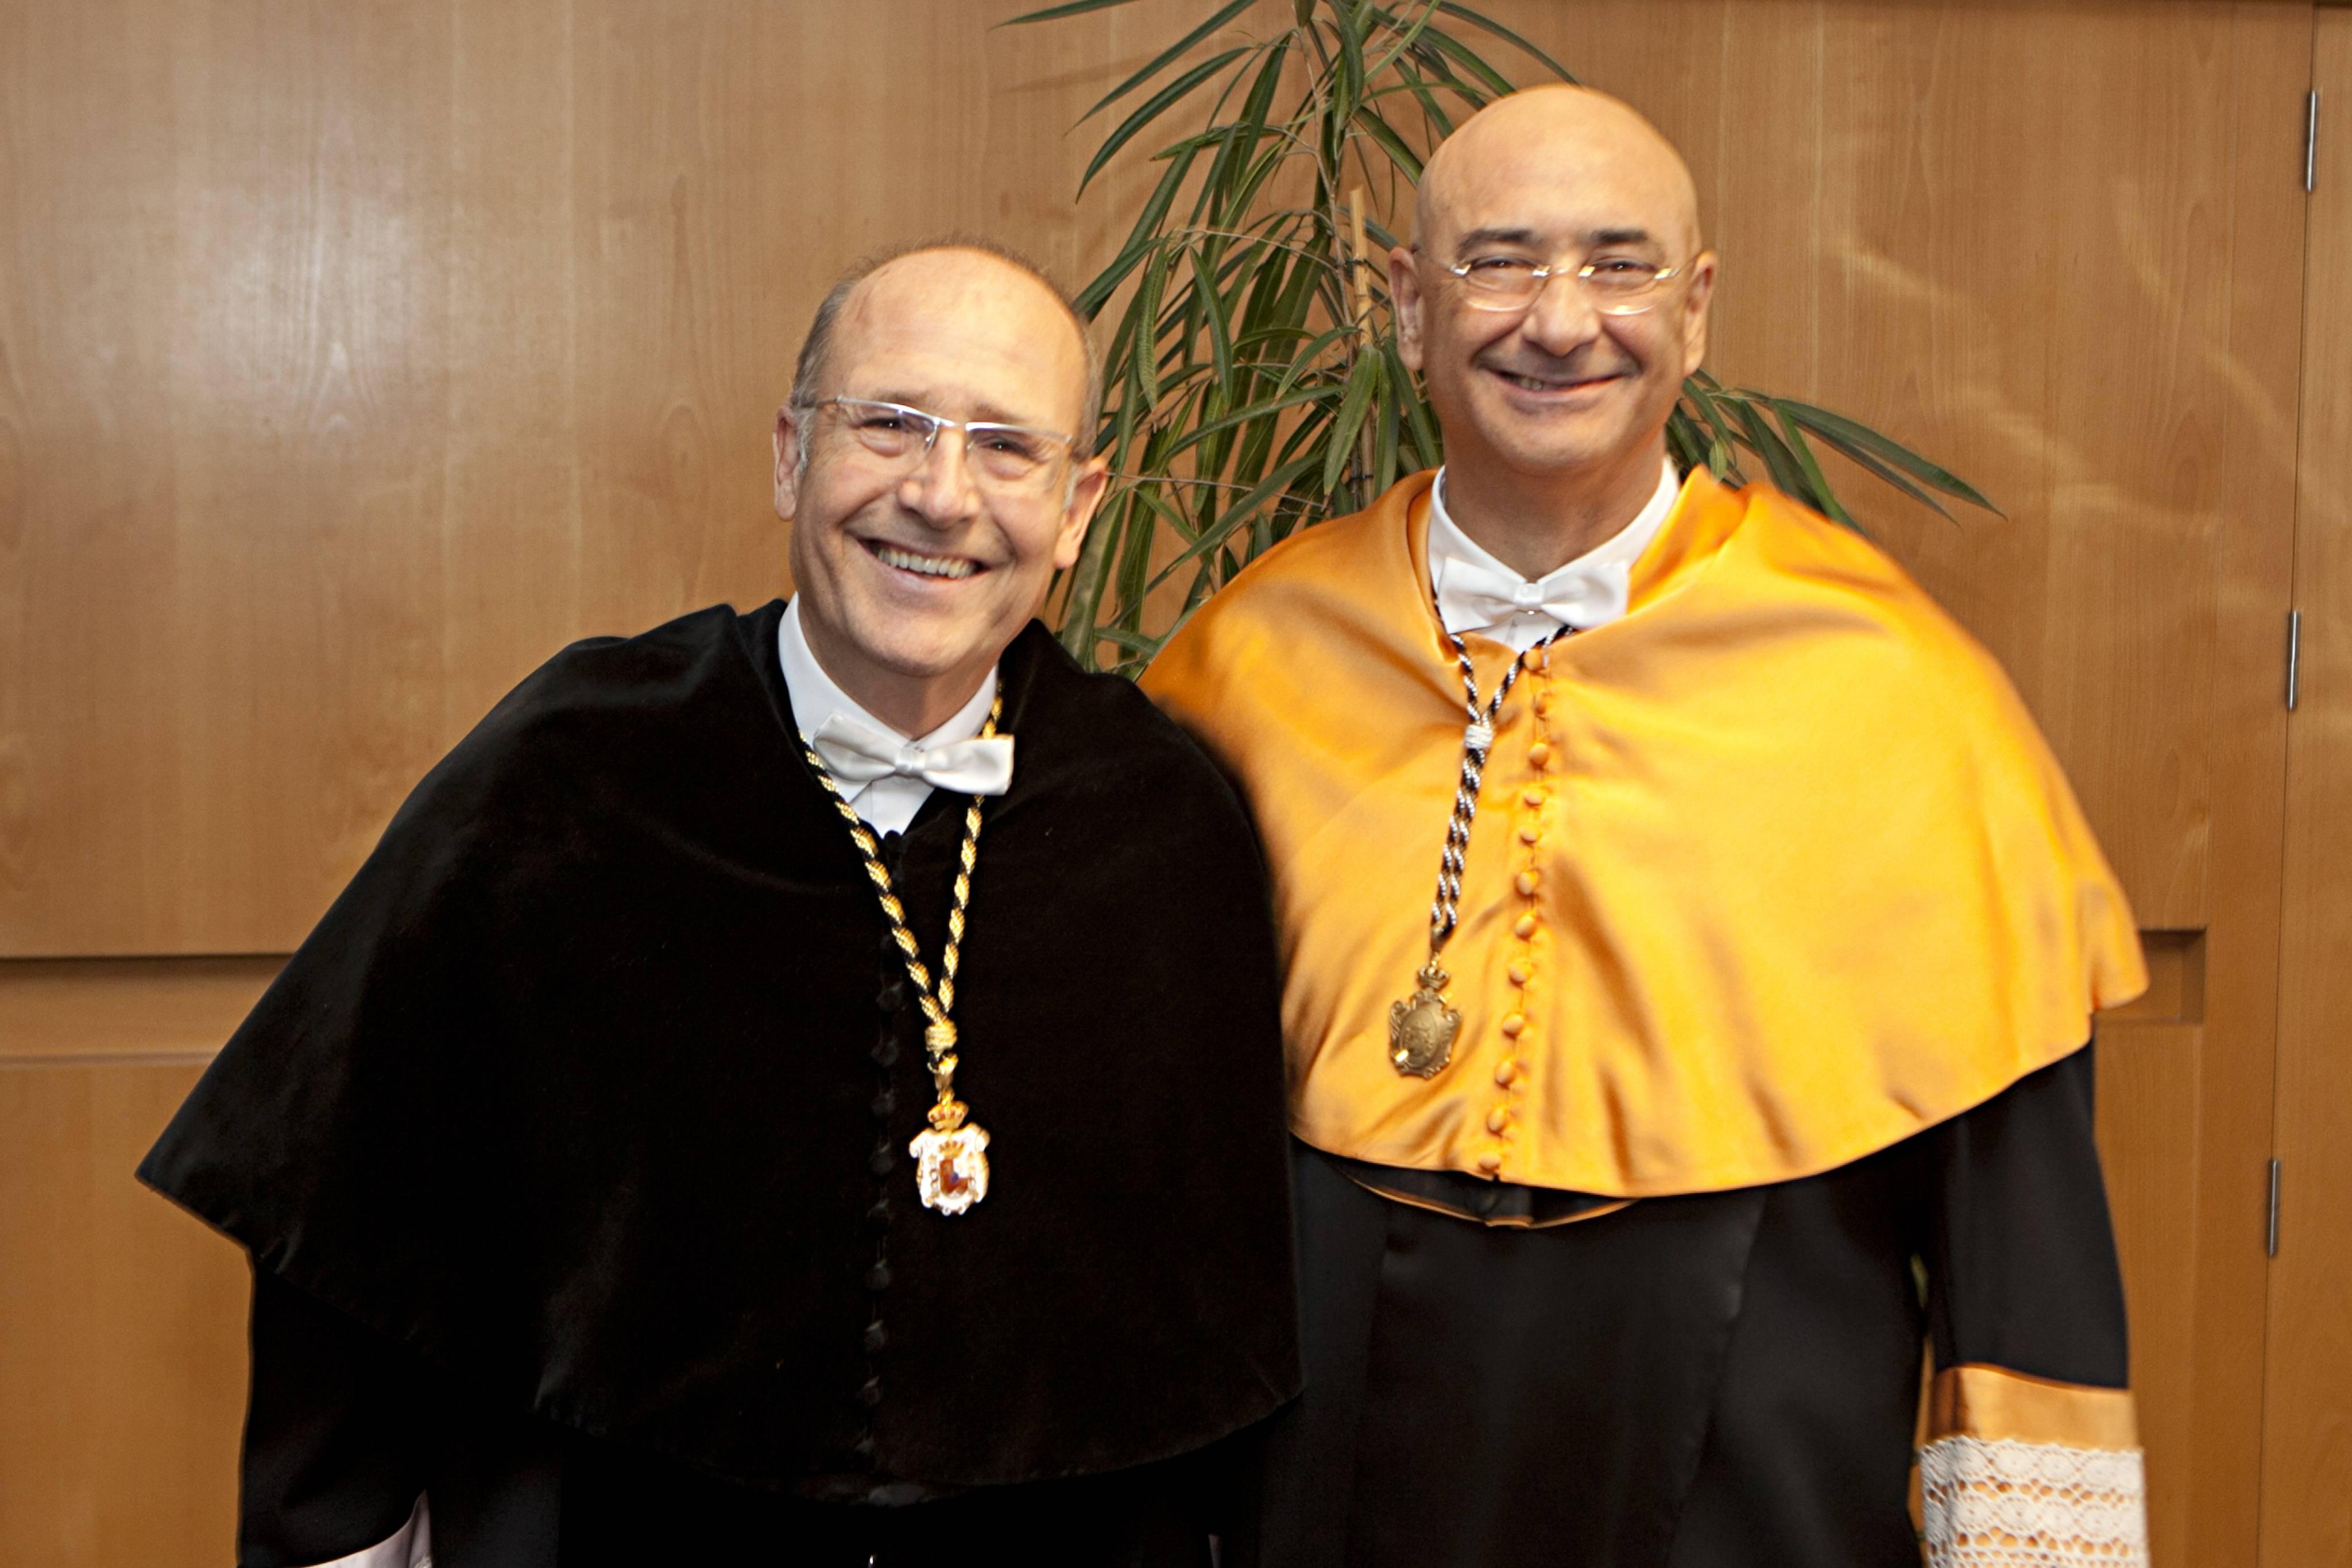 doctor-honoris-causa-luis-gamir_mg_1301.jpg